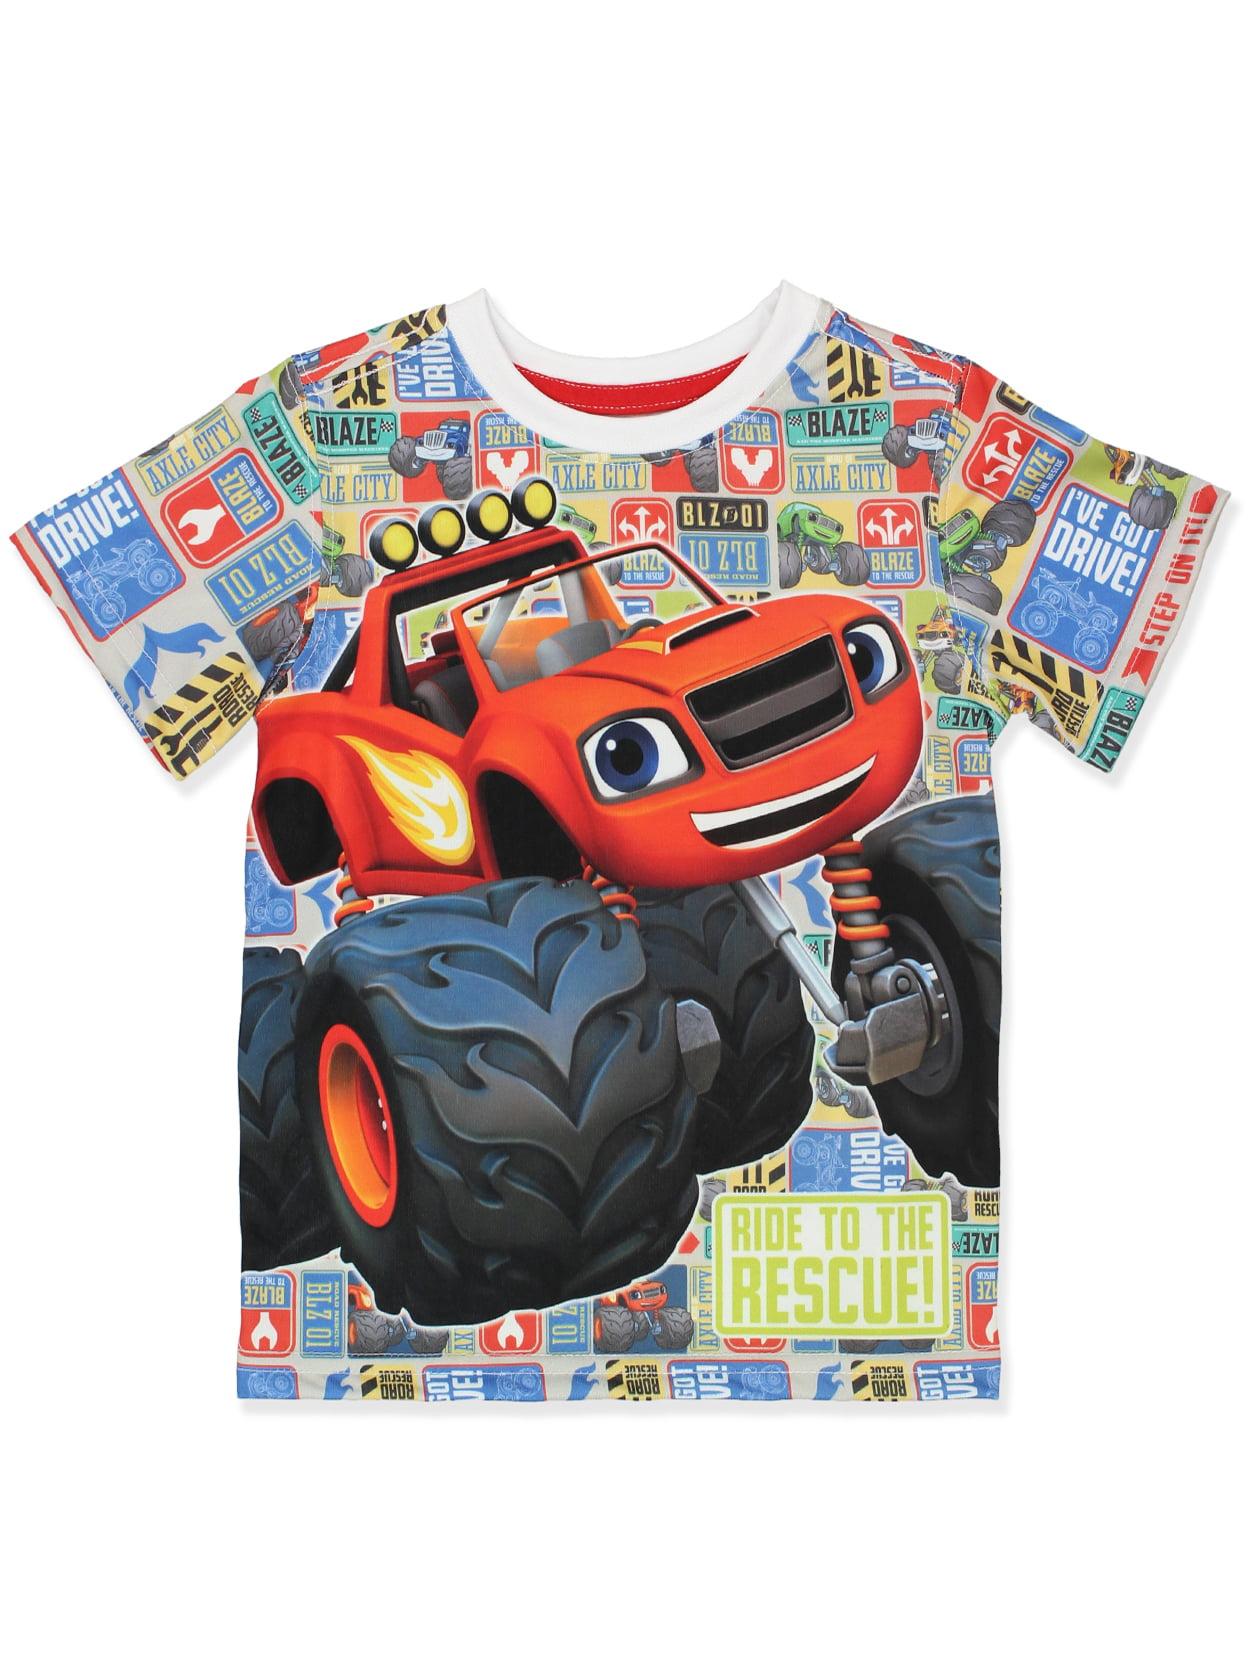 Nickelodeon Blaze and the Monster Machines Boys Short Sleeve Tee 8NZ6756